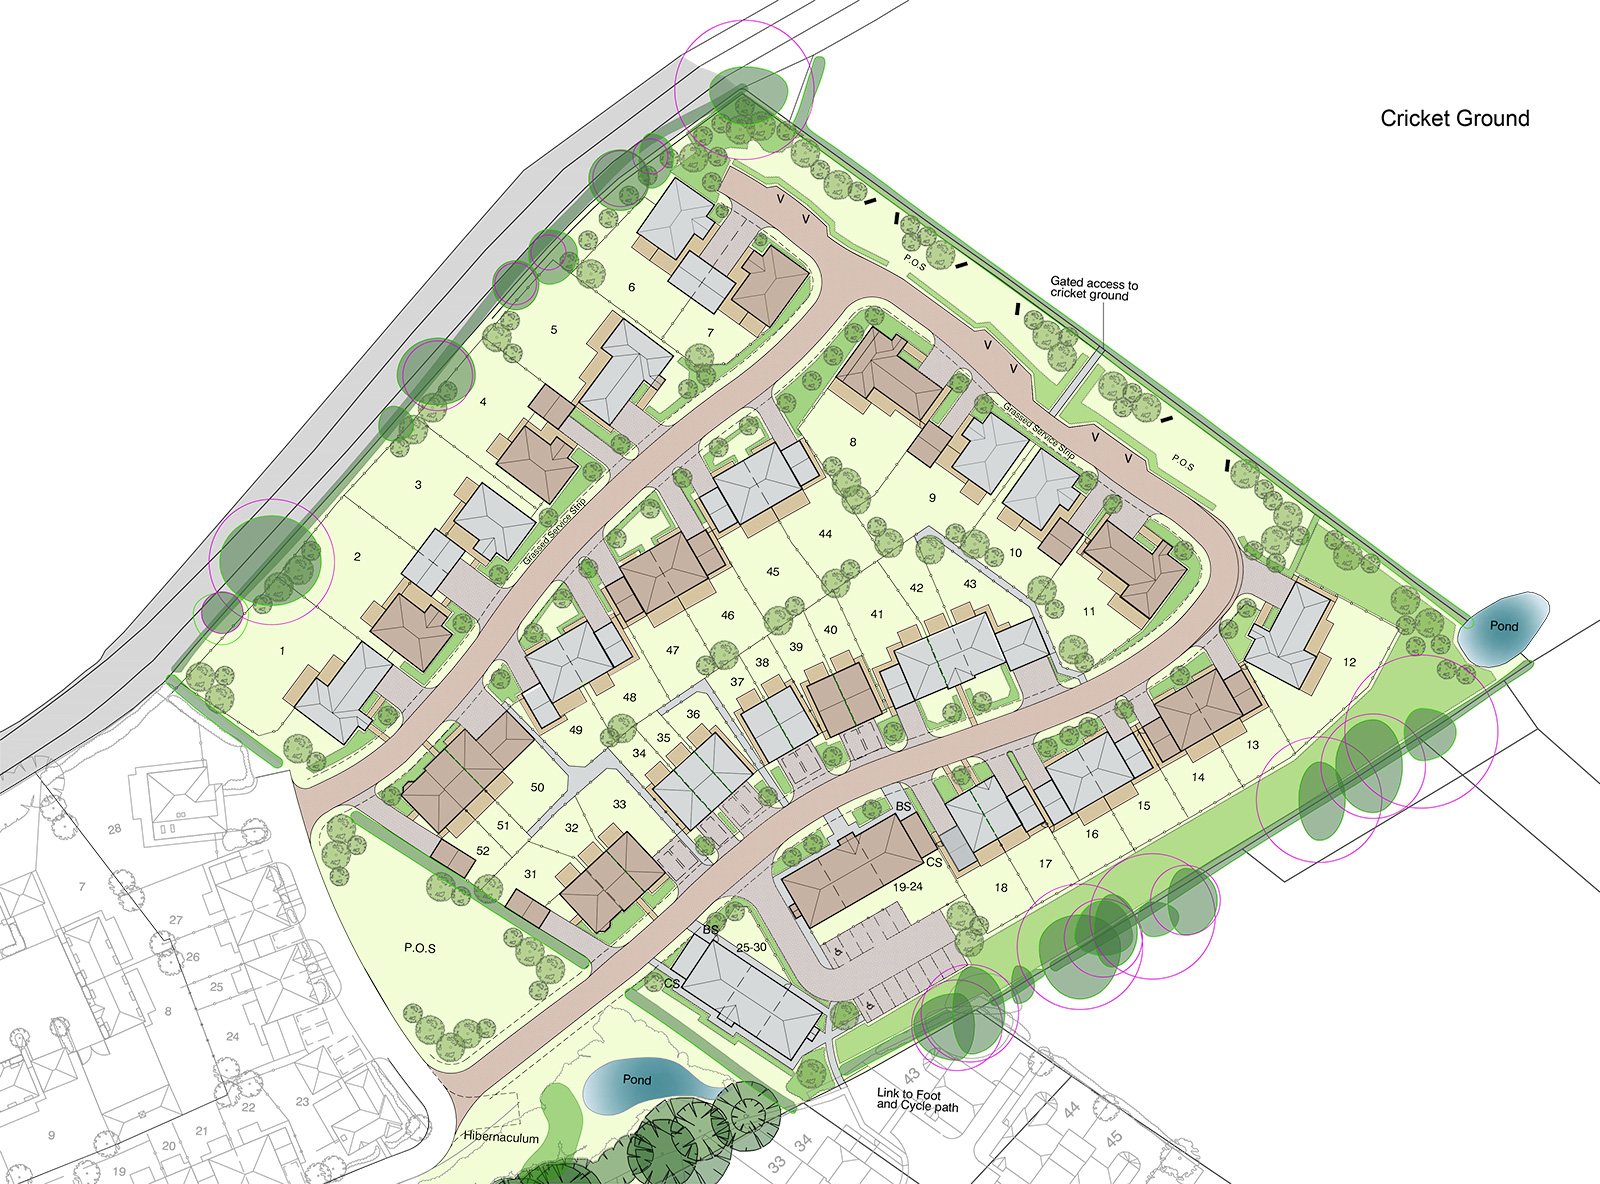 Headcorn, Maidstone Borough Council